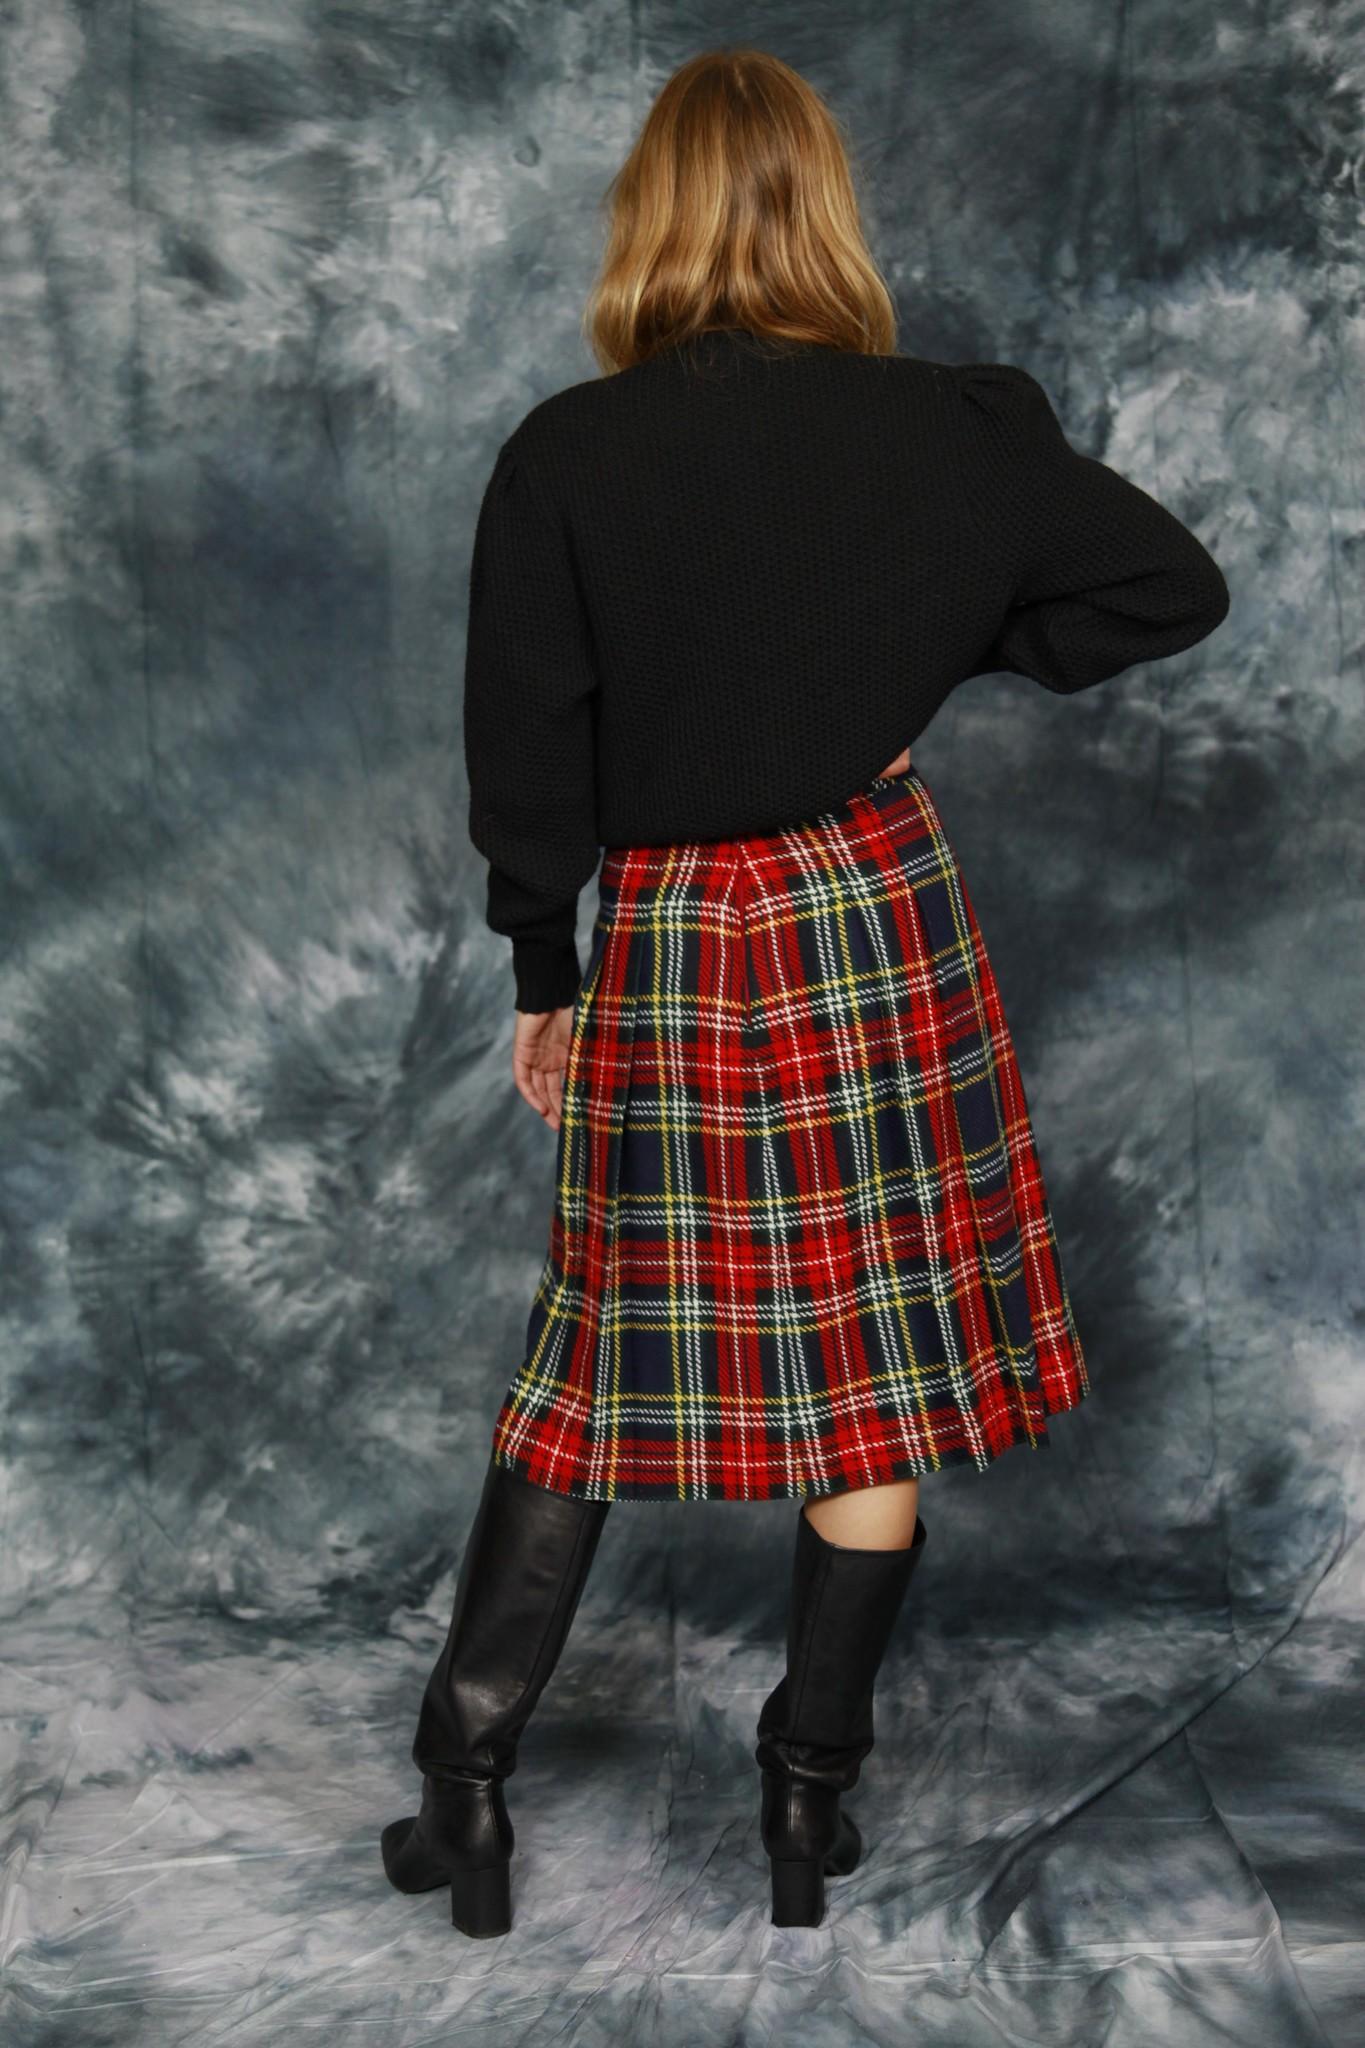 Classy wool skirt